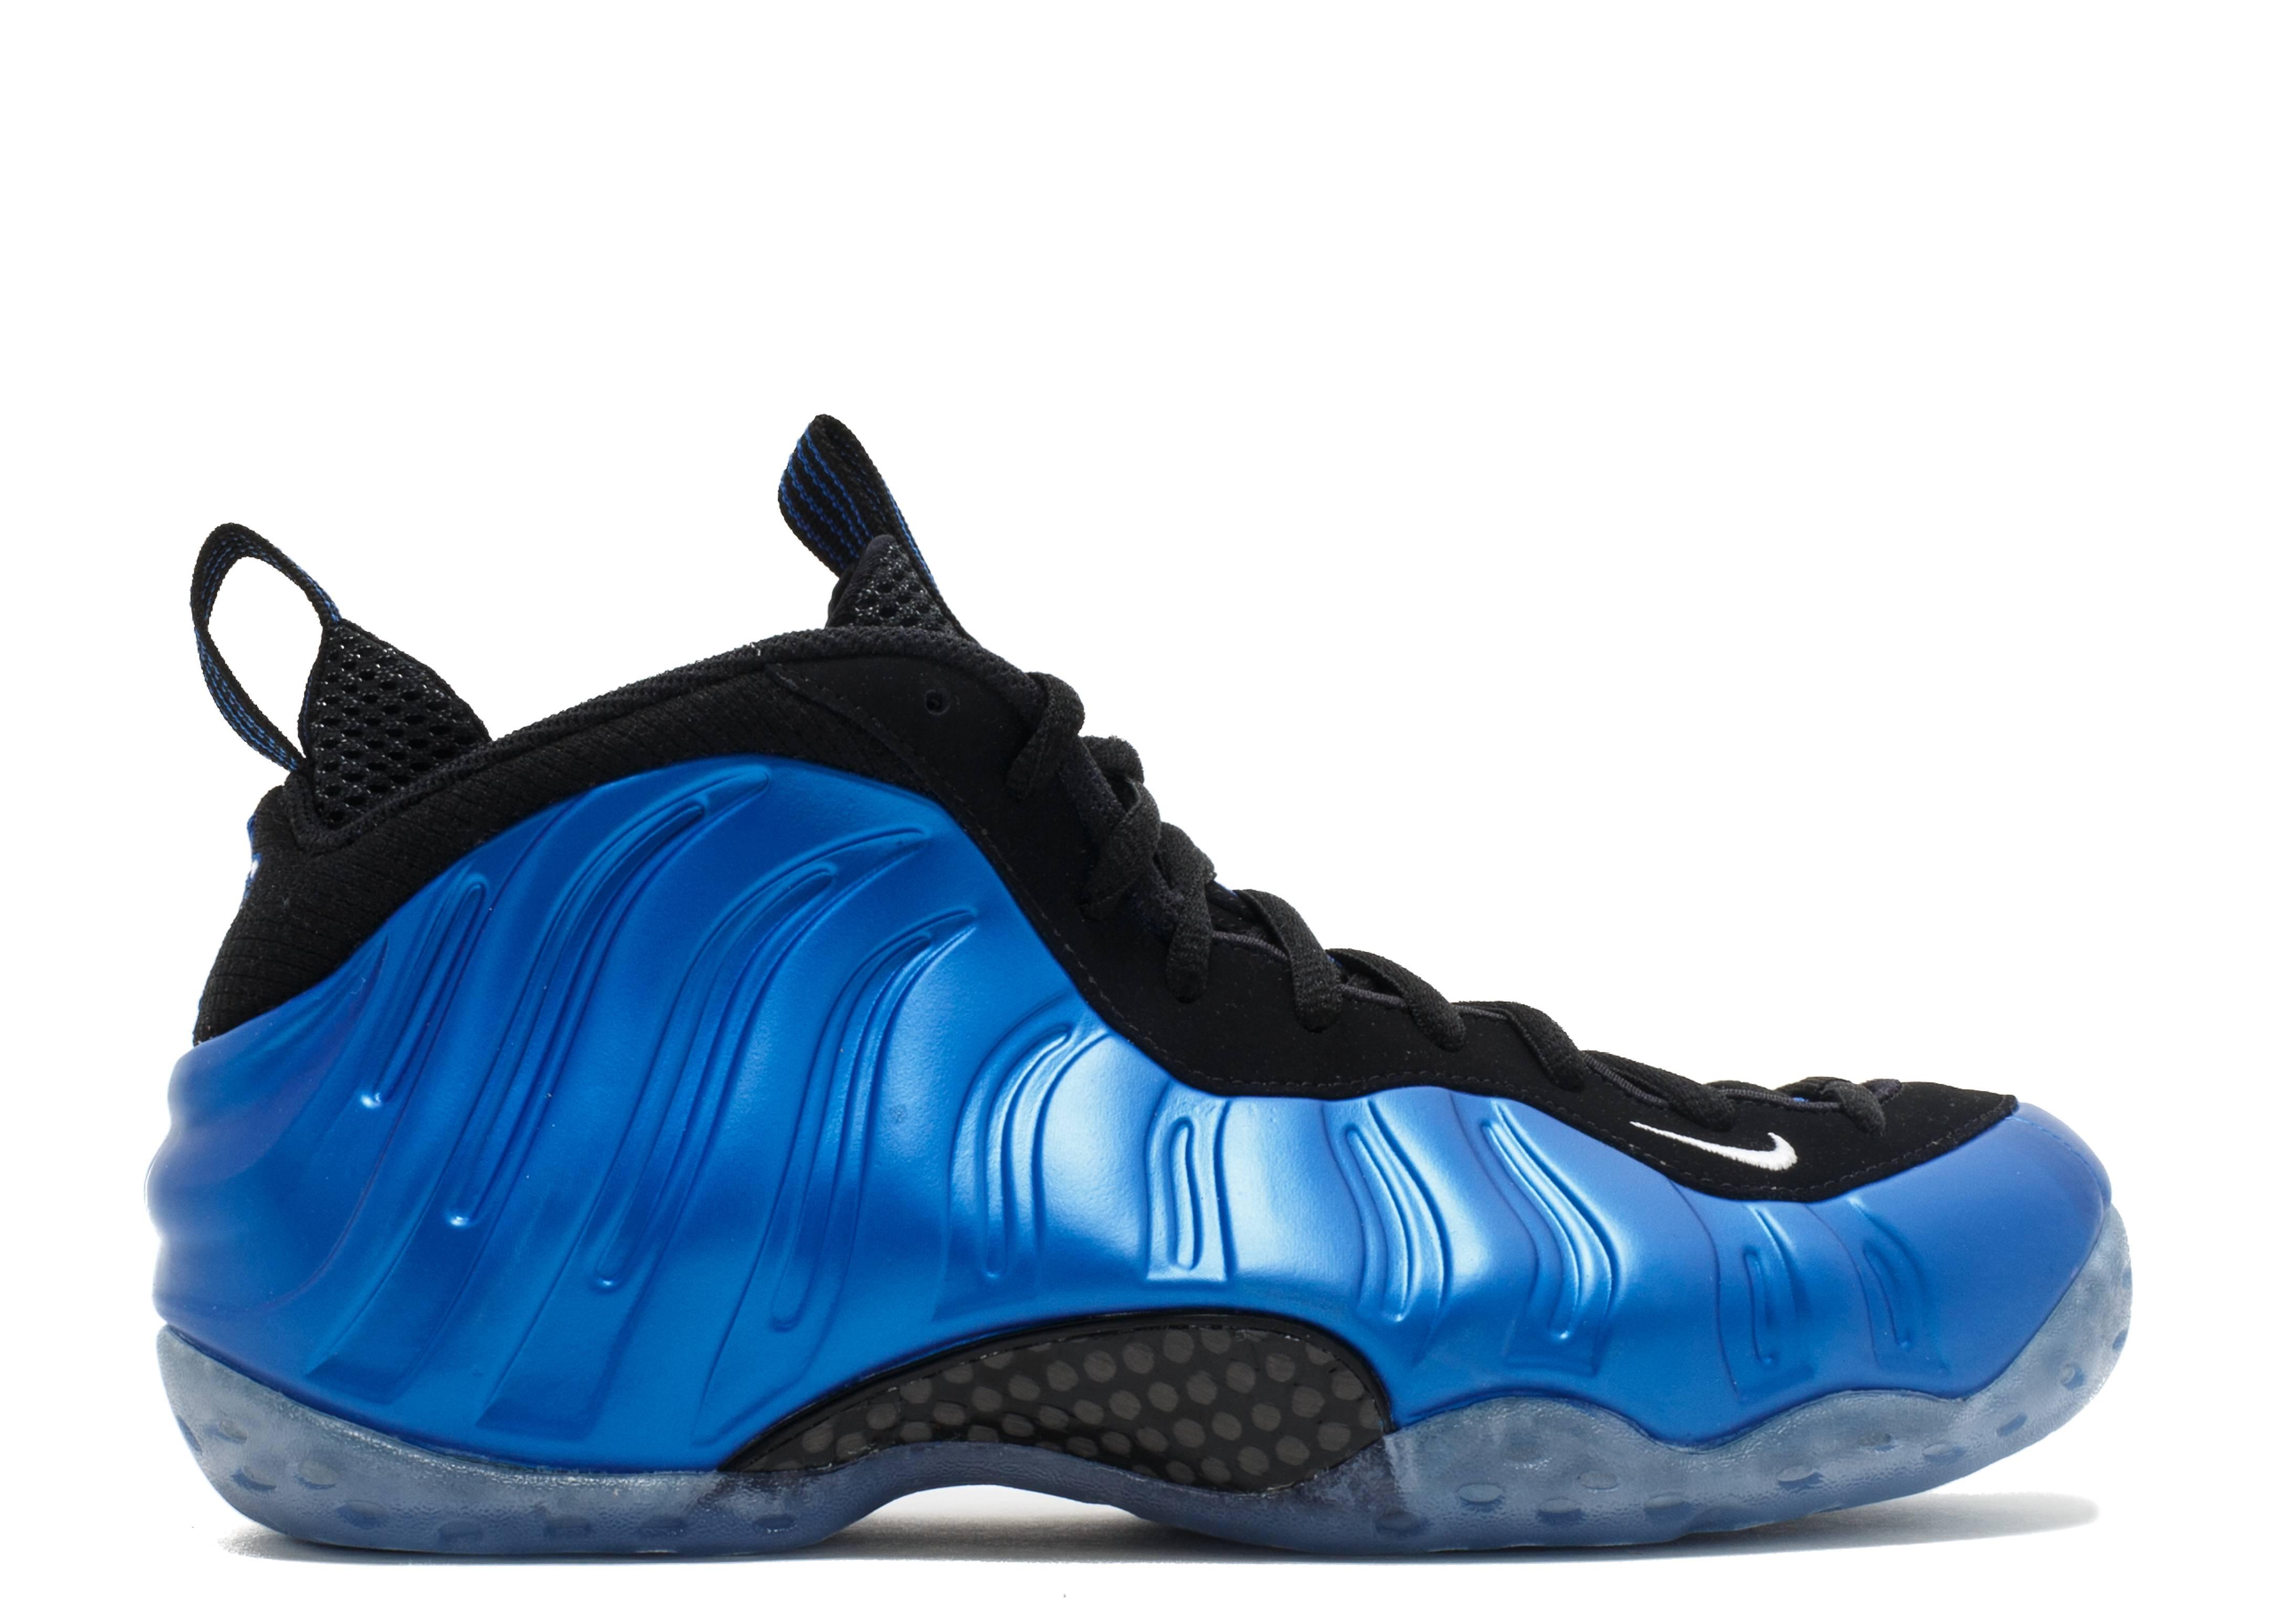 Penny Hardaway Shoes Blue